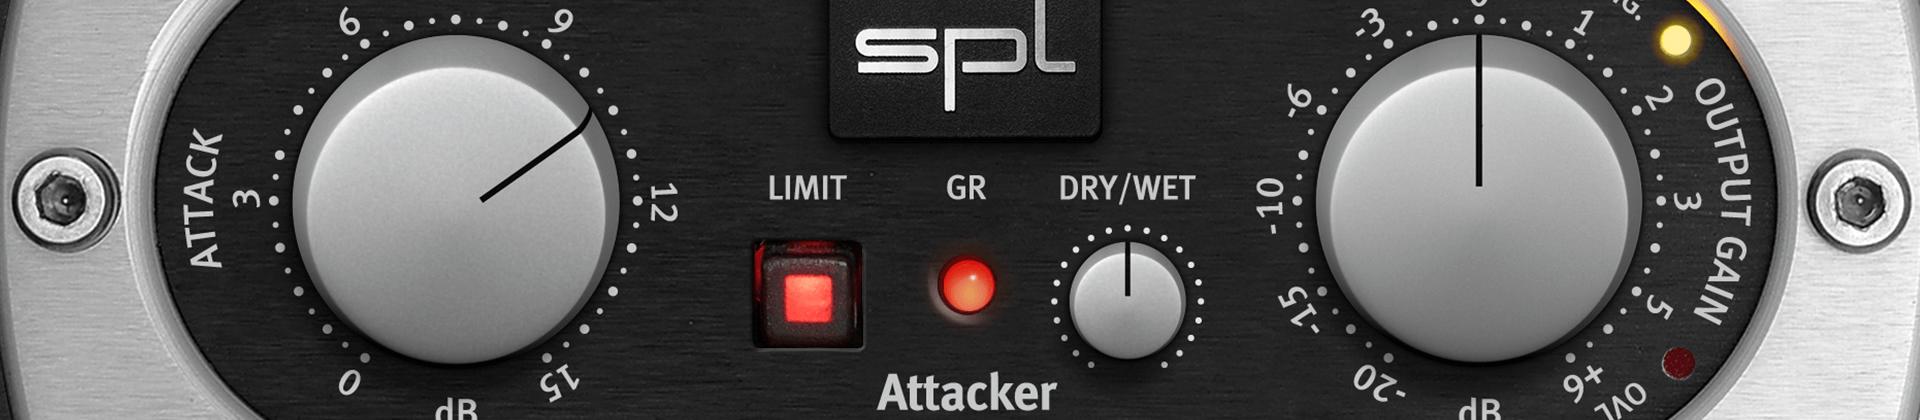 spl attacker plus plugin alliance. Black Bedroom Furniture Sets. Home Design Ideas